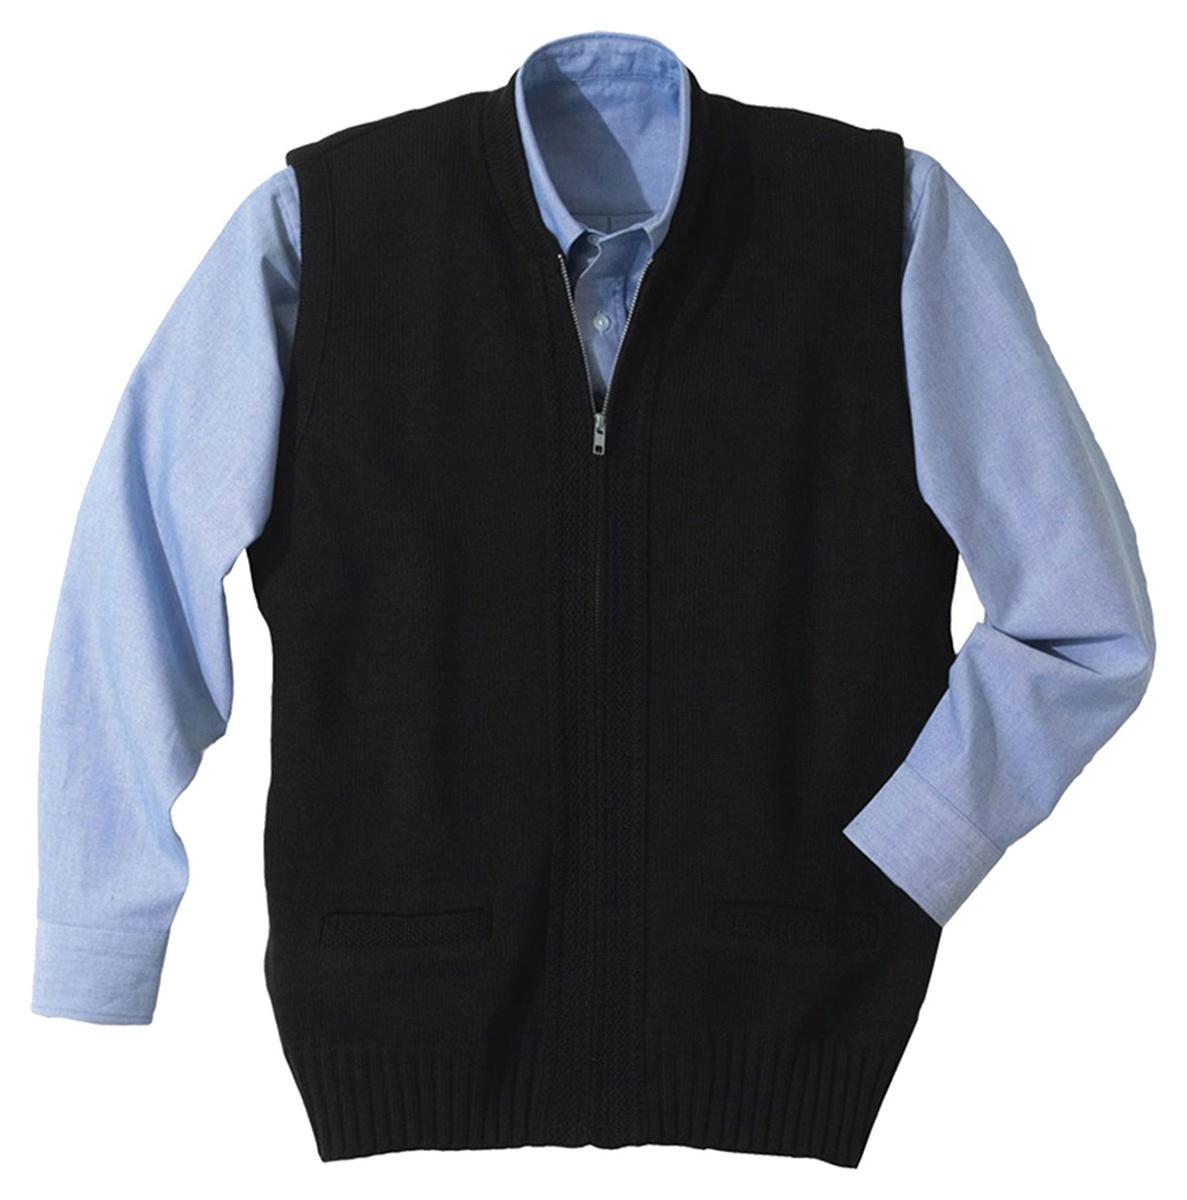 'Edwards 302 Full-Zip Heavyweight Acrylic Sweater Vest'